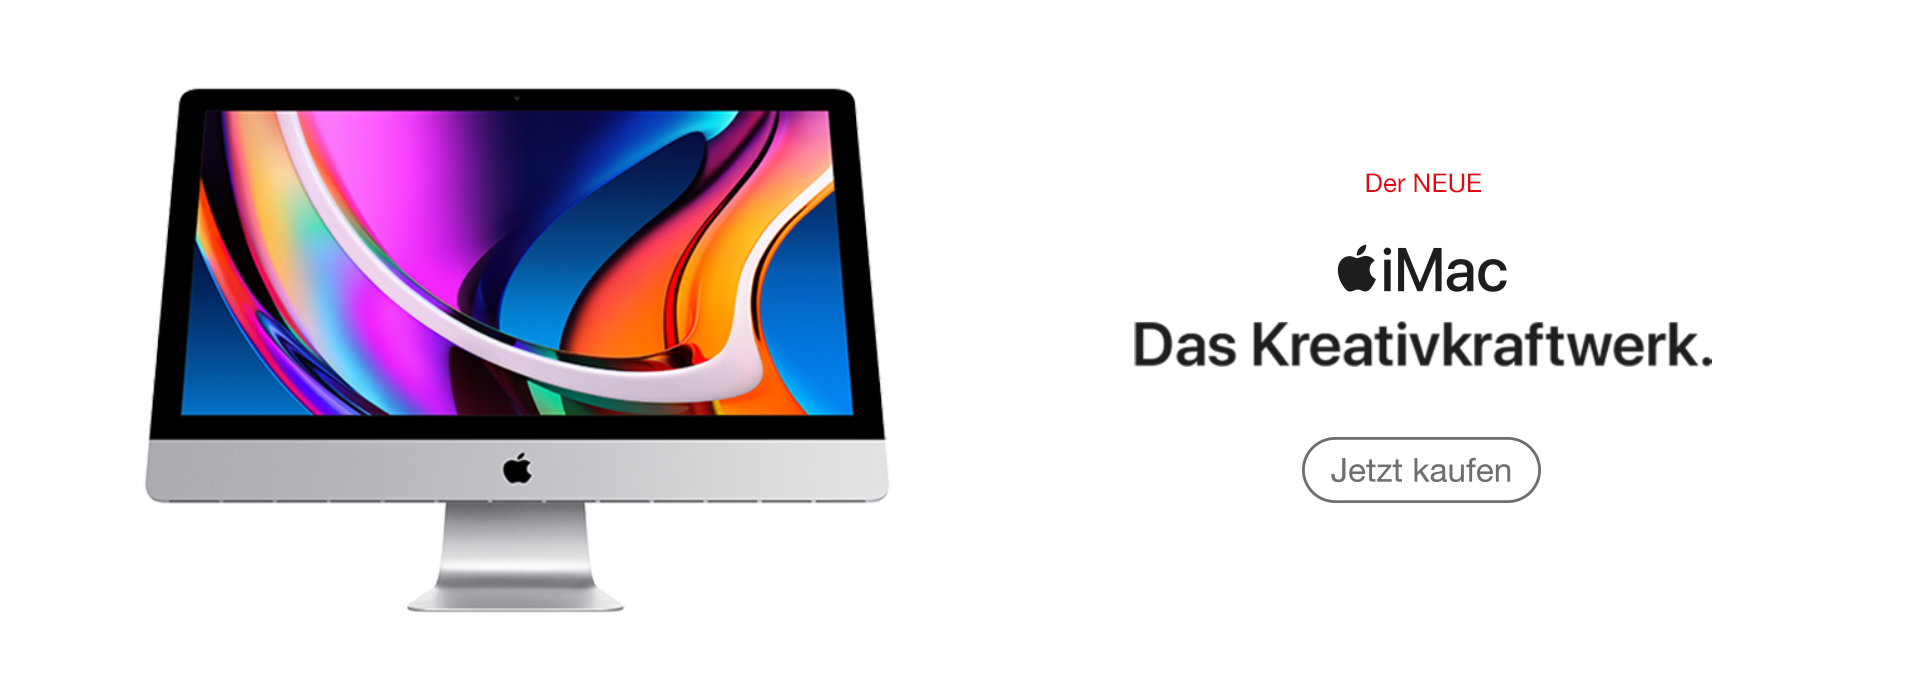 Jetzt Apple iMac kaufen